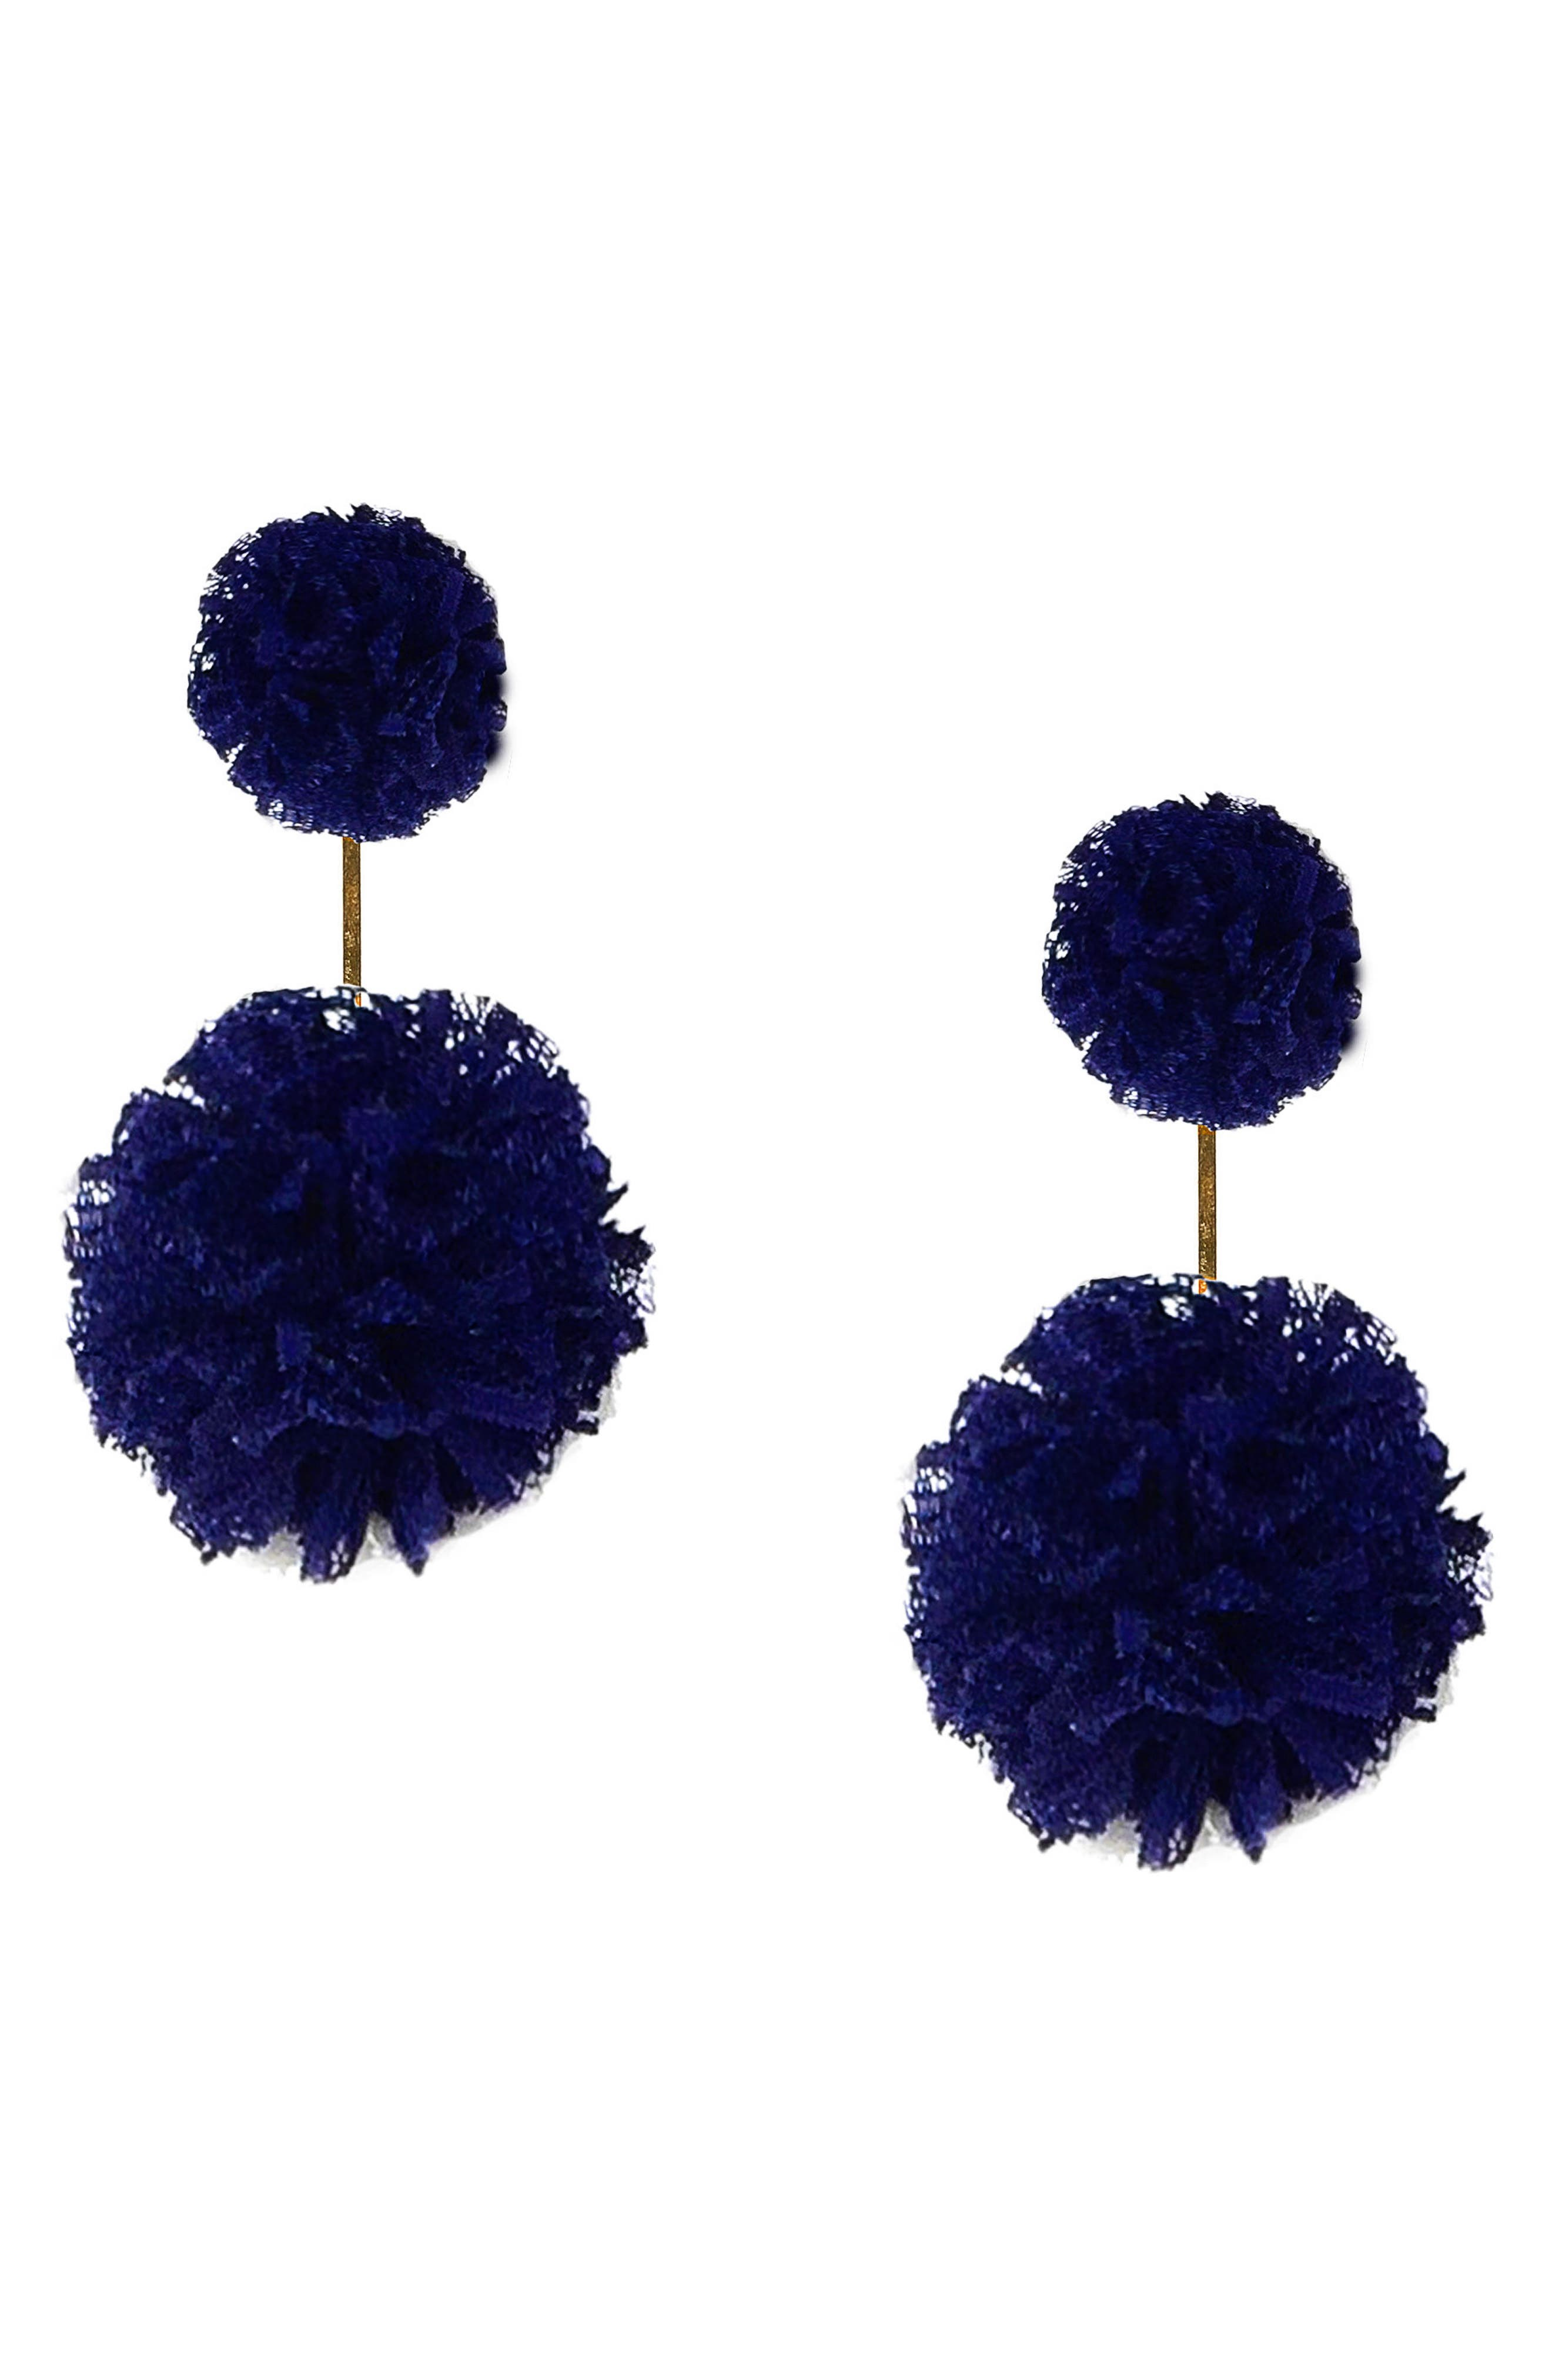 Double Lace Pom Pom Earrings,                             Main thumbnail 1, color,                             Gold/ Cobalt Blue